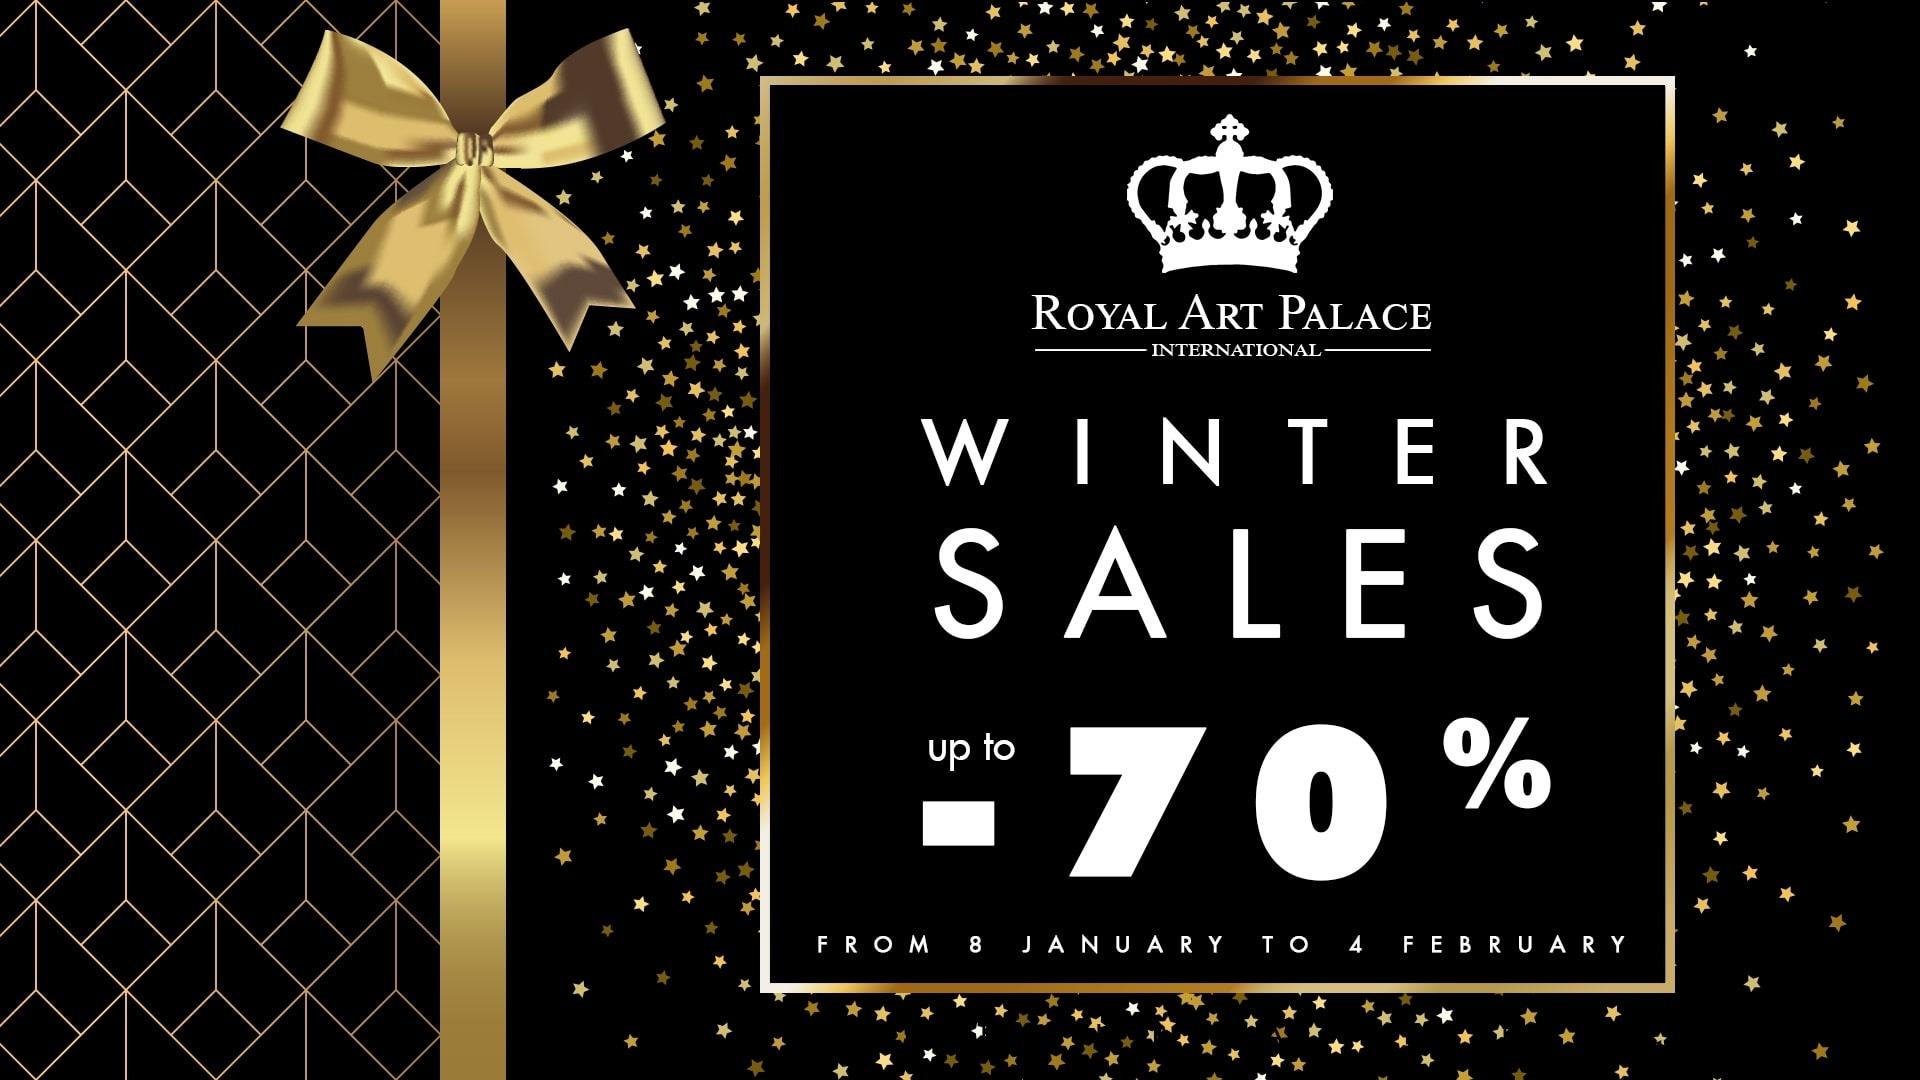 Winter sales 2020